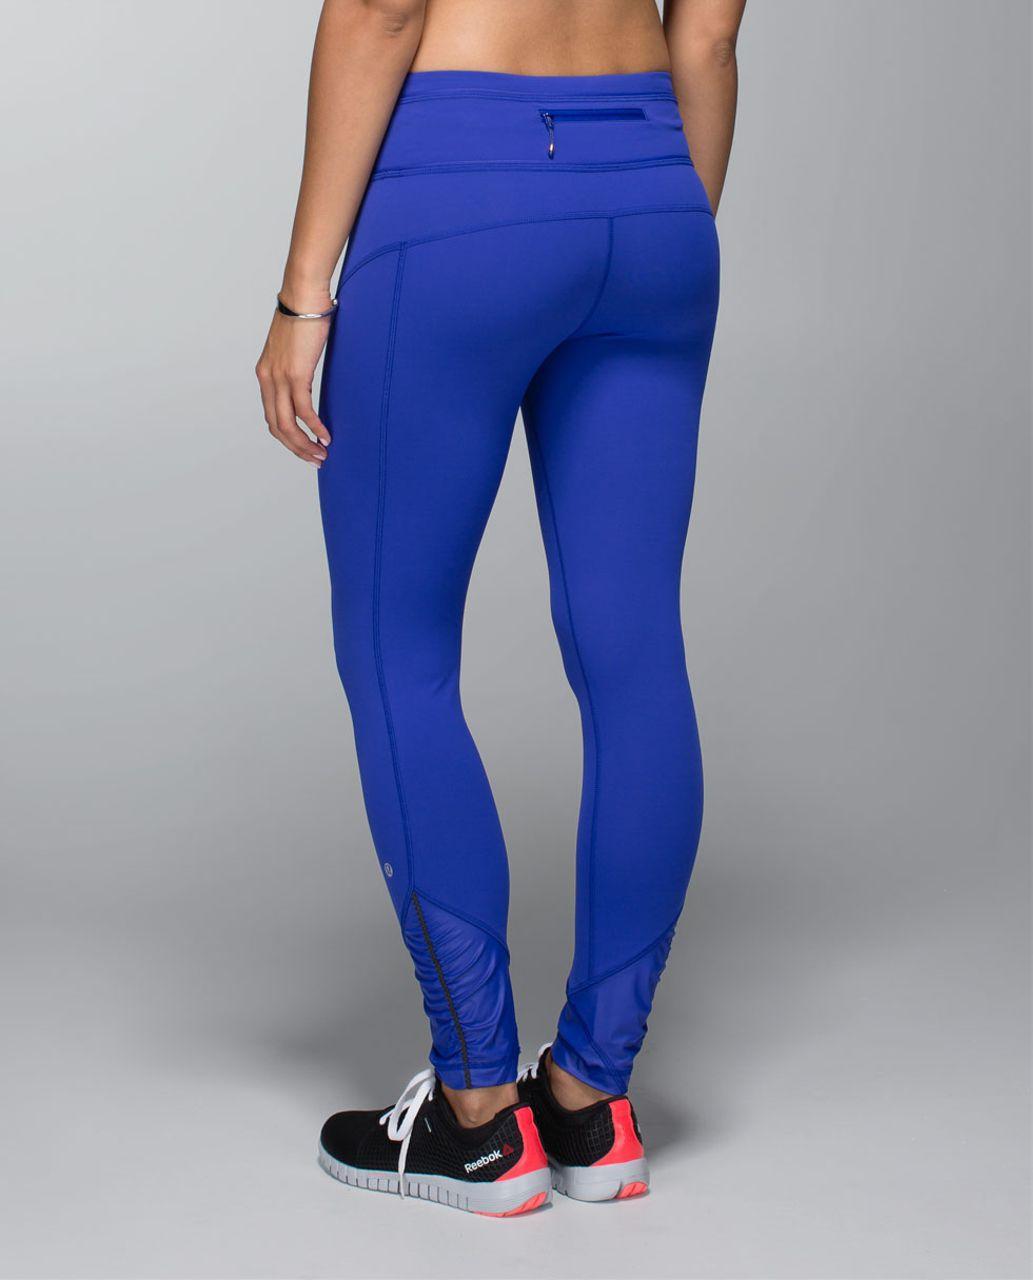 Lululemon Pace Queen Tight - Pigment Blue